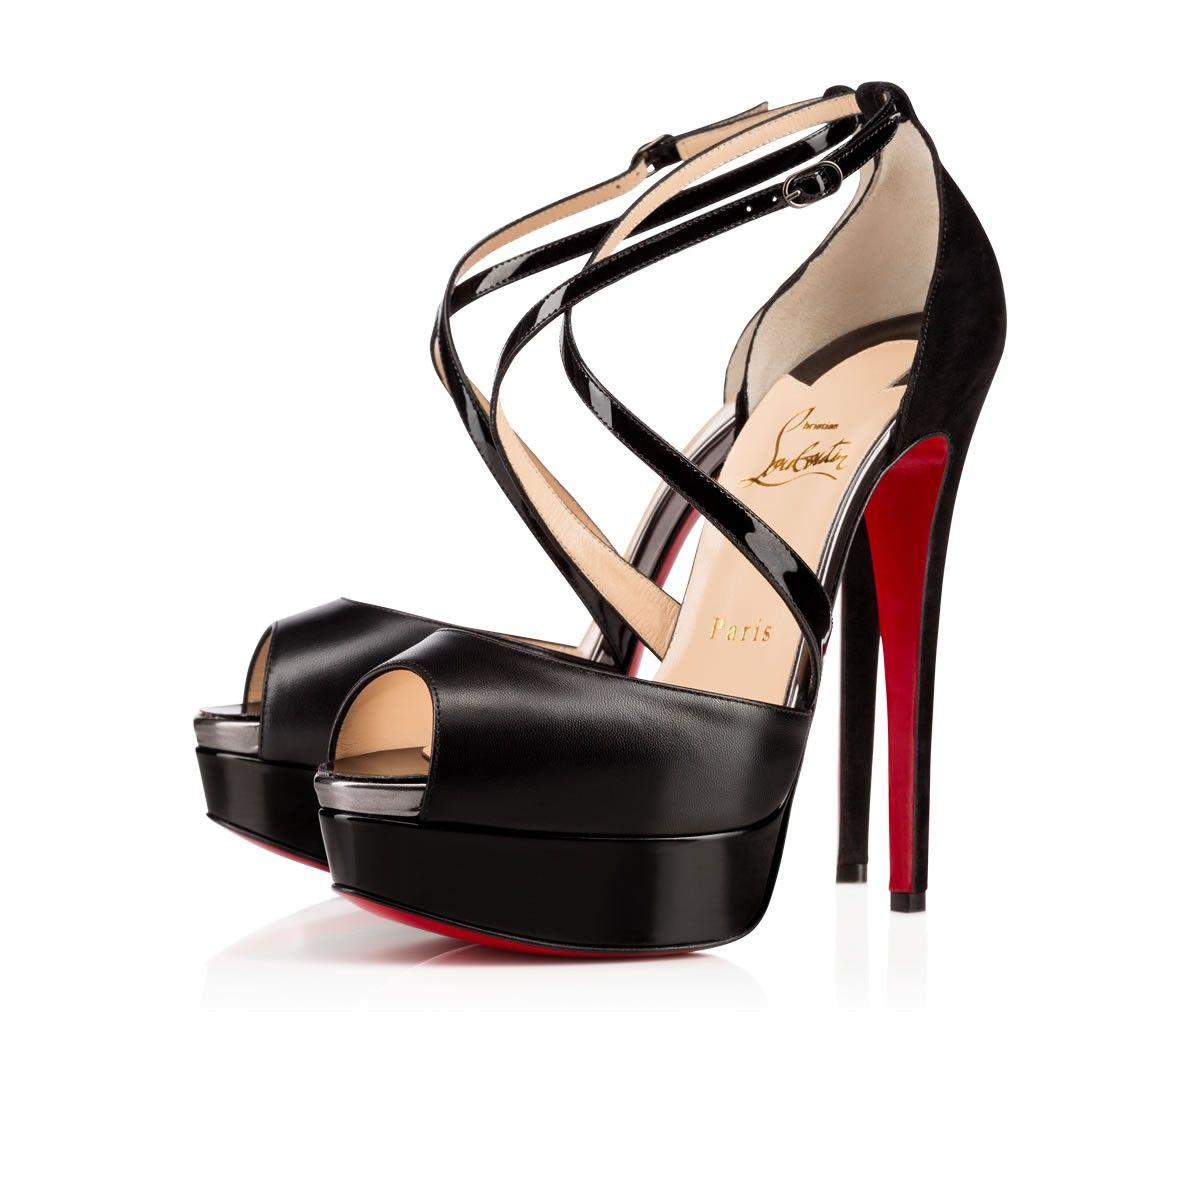 Women Shoes - Cross Me Kid/patent - Christian Louboutin